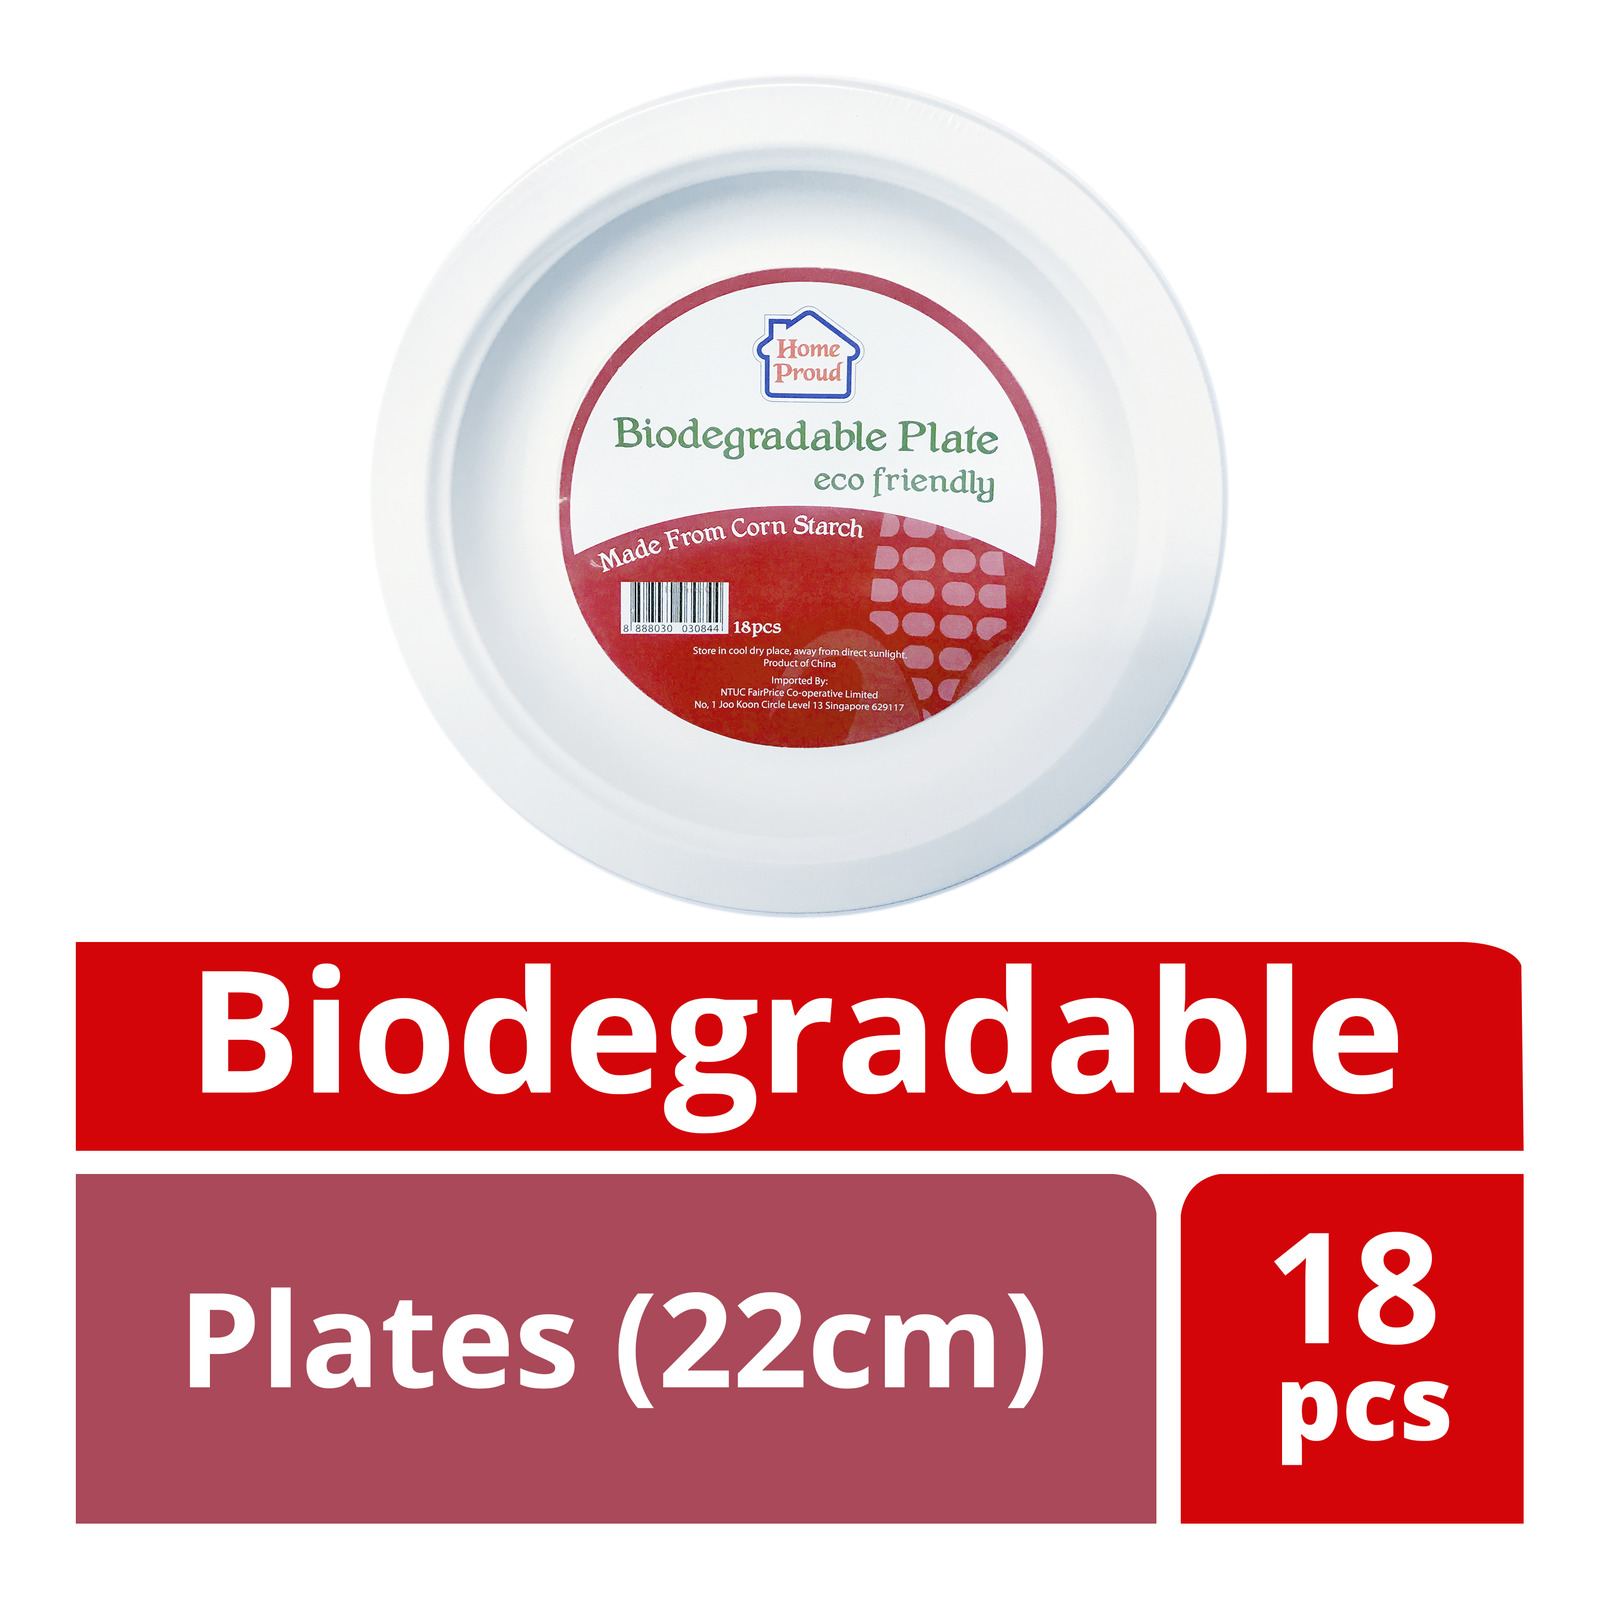 HomeProud Biodegradable Plates (22cm)